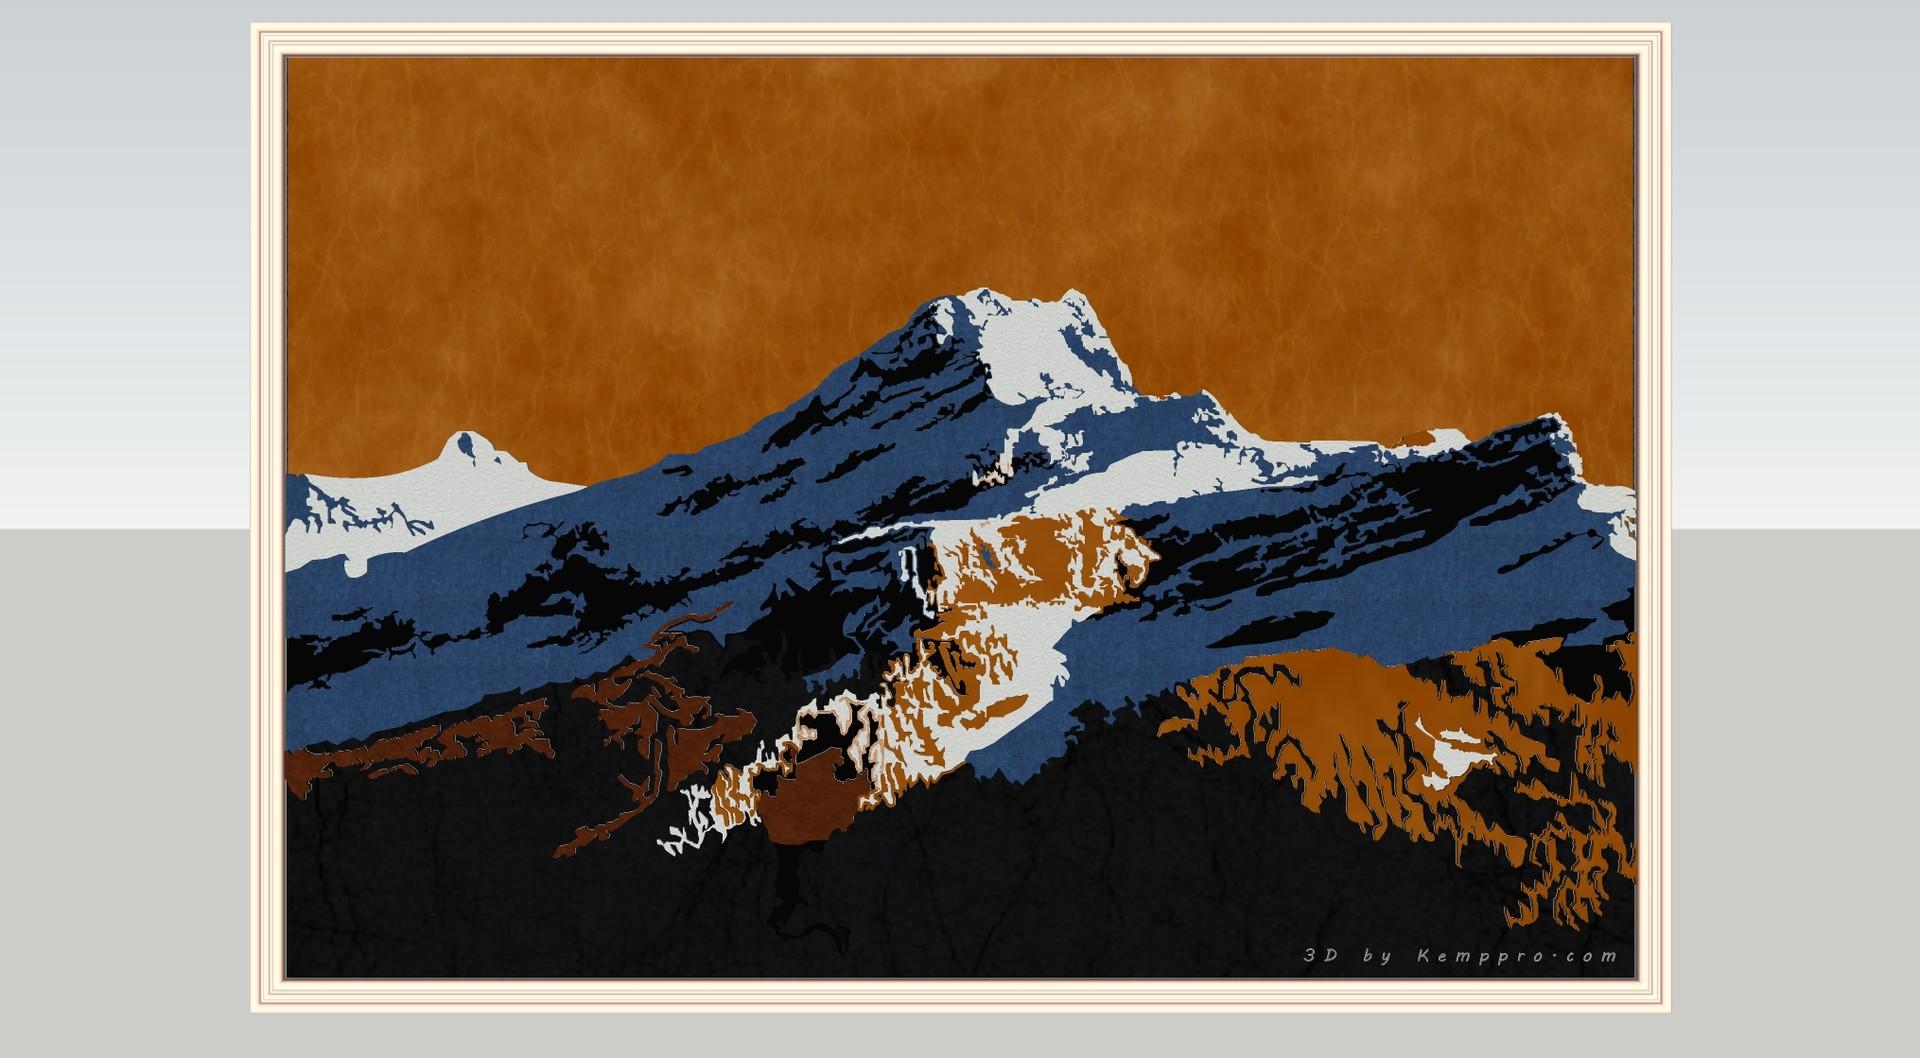 Duane kemp 02 diableret mountain logo 02 leather su screenshot